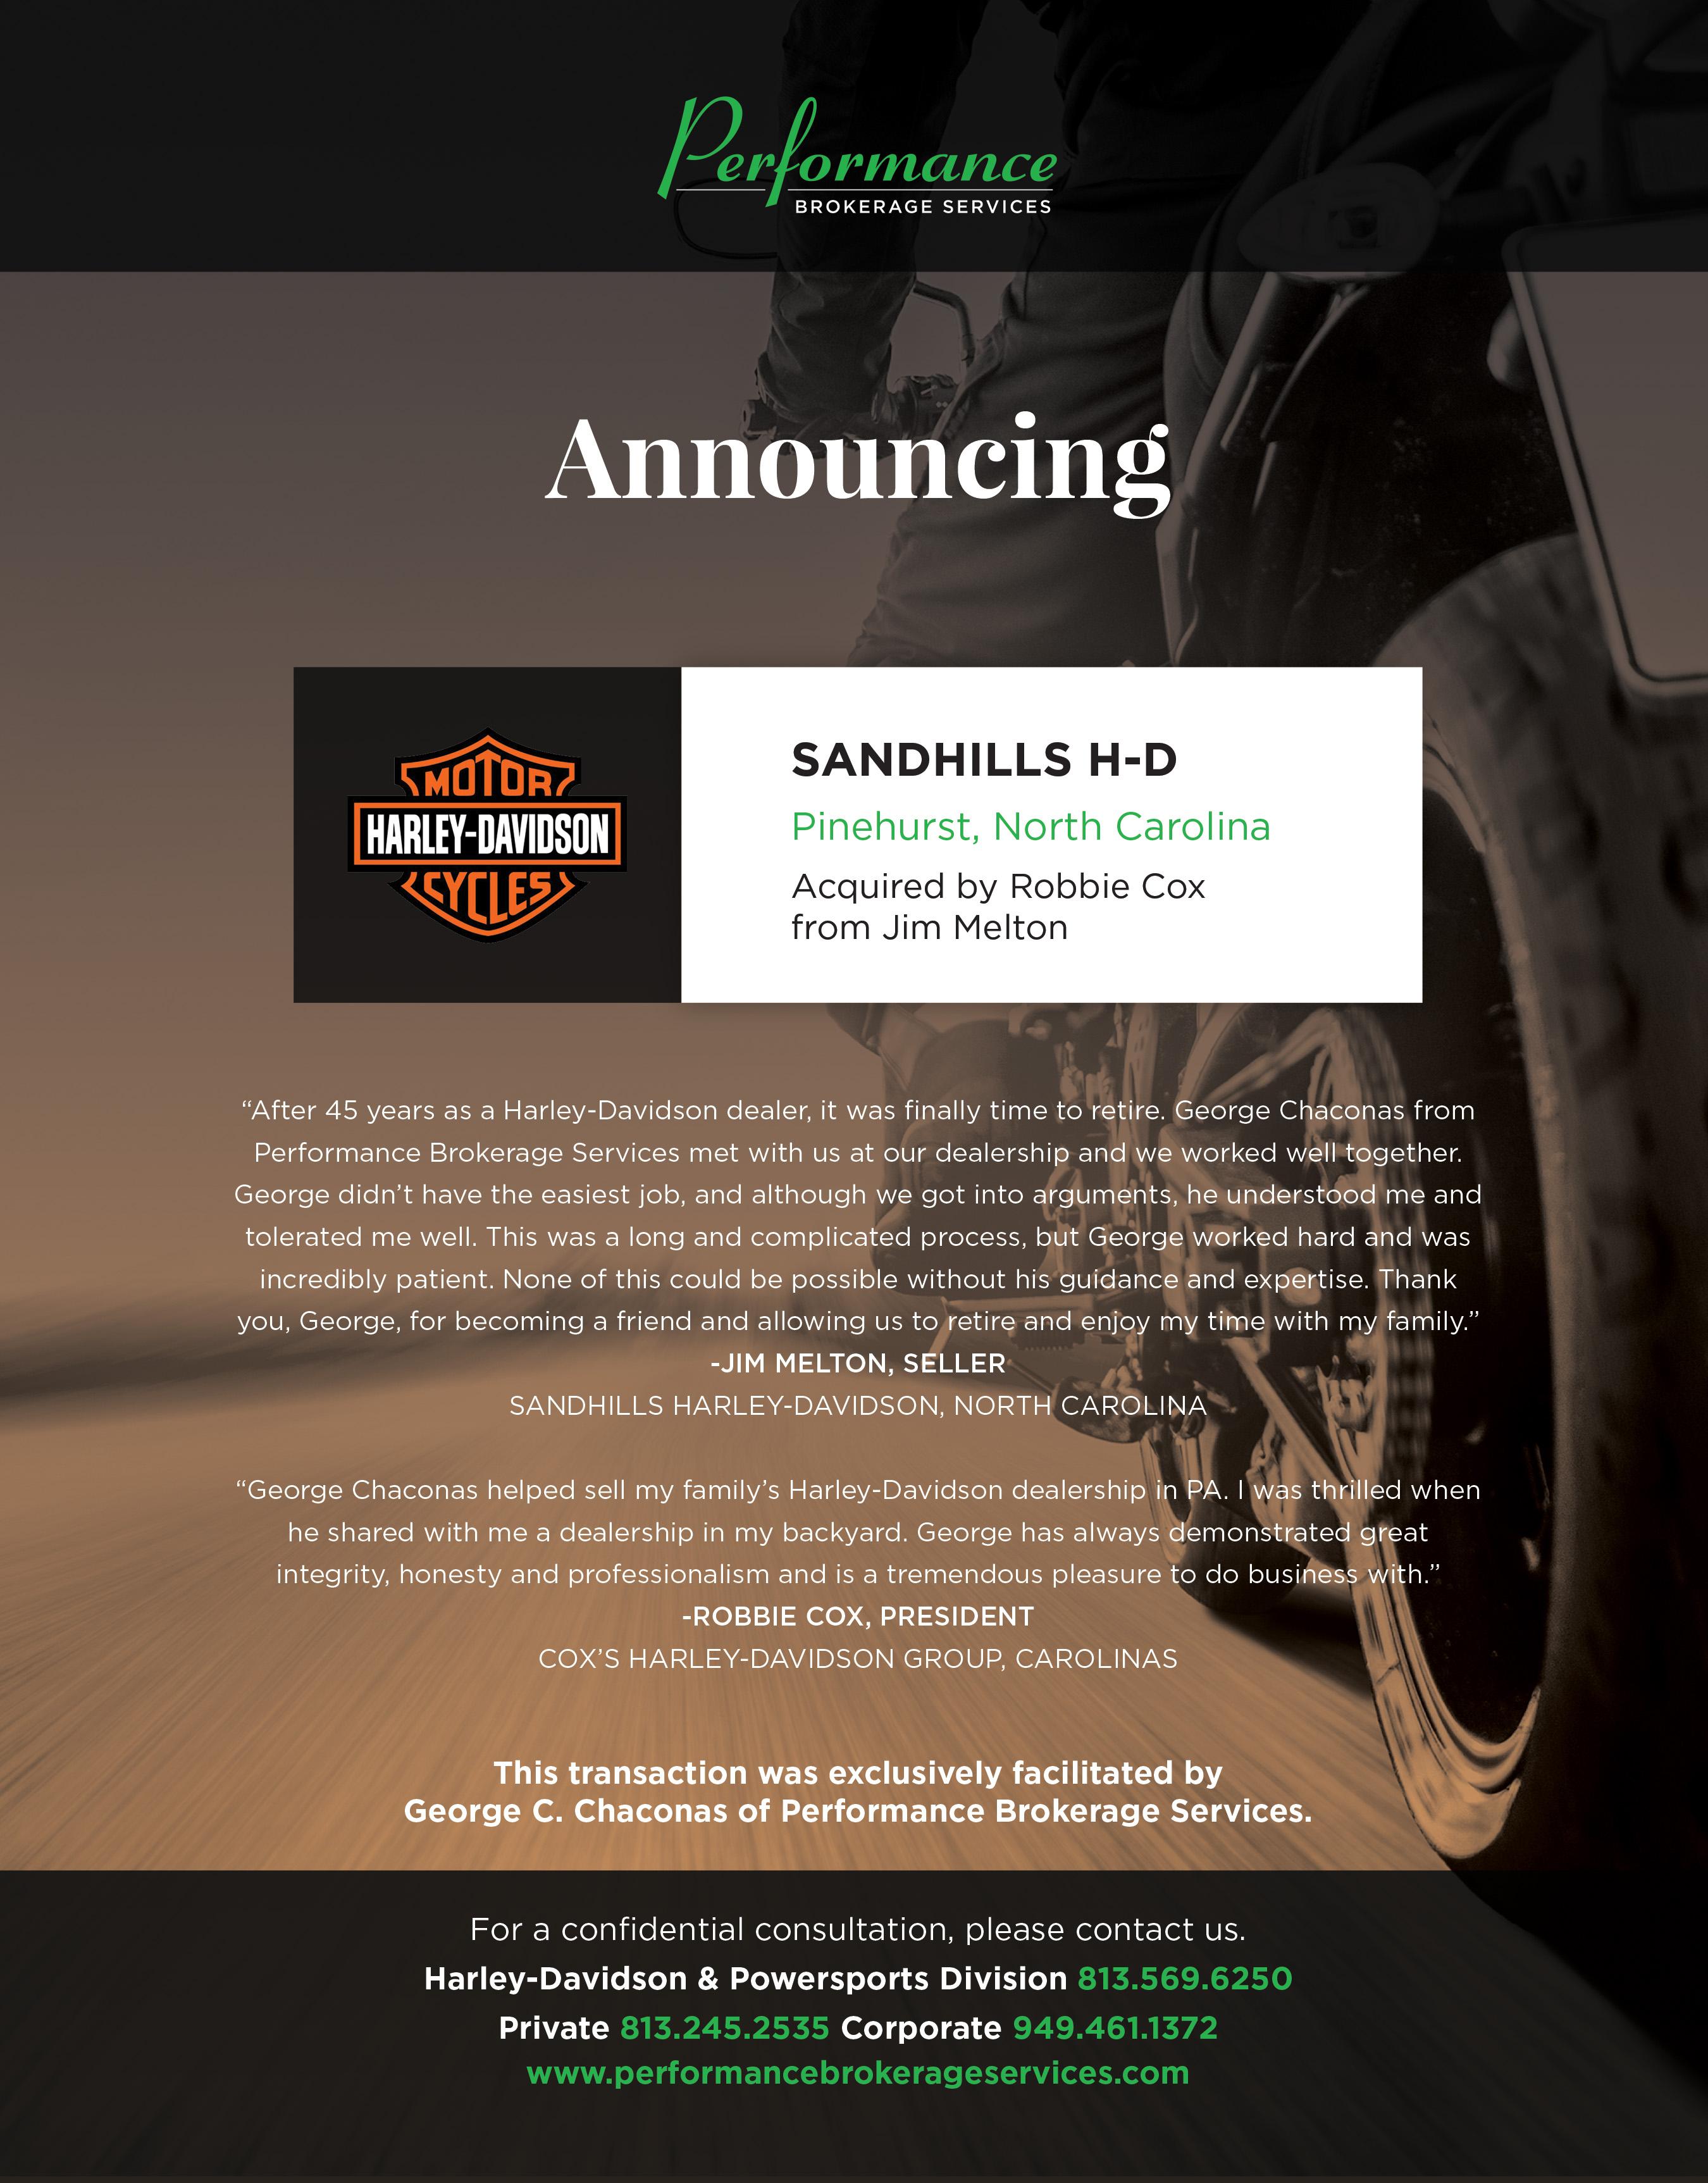 Jim Melton Sells Sandhills Harley-Davidson in Pinehurst